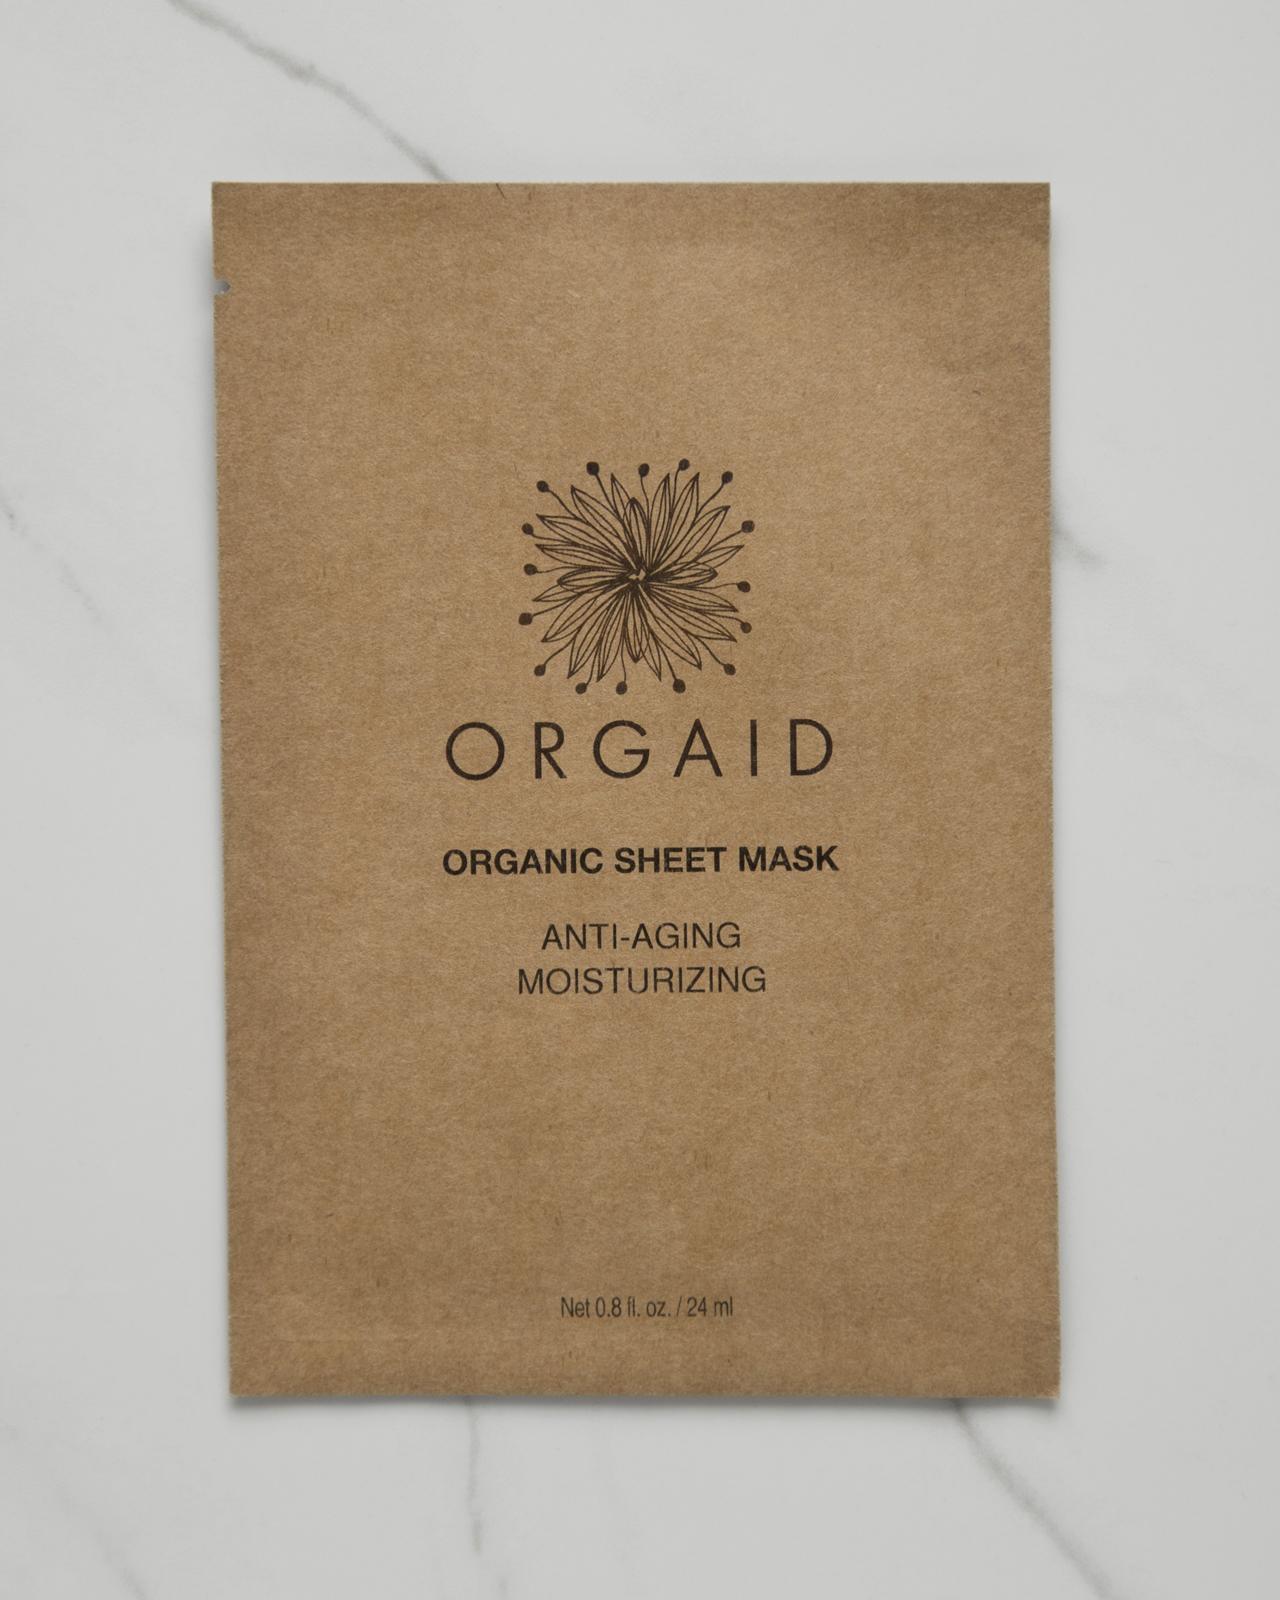 Orgaid Anti-Aging & Moisturizing Organic Sheet Mask $6